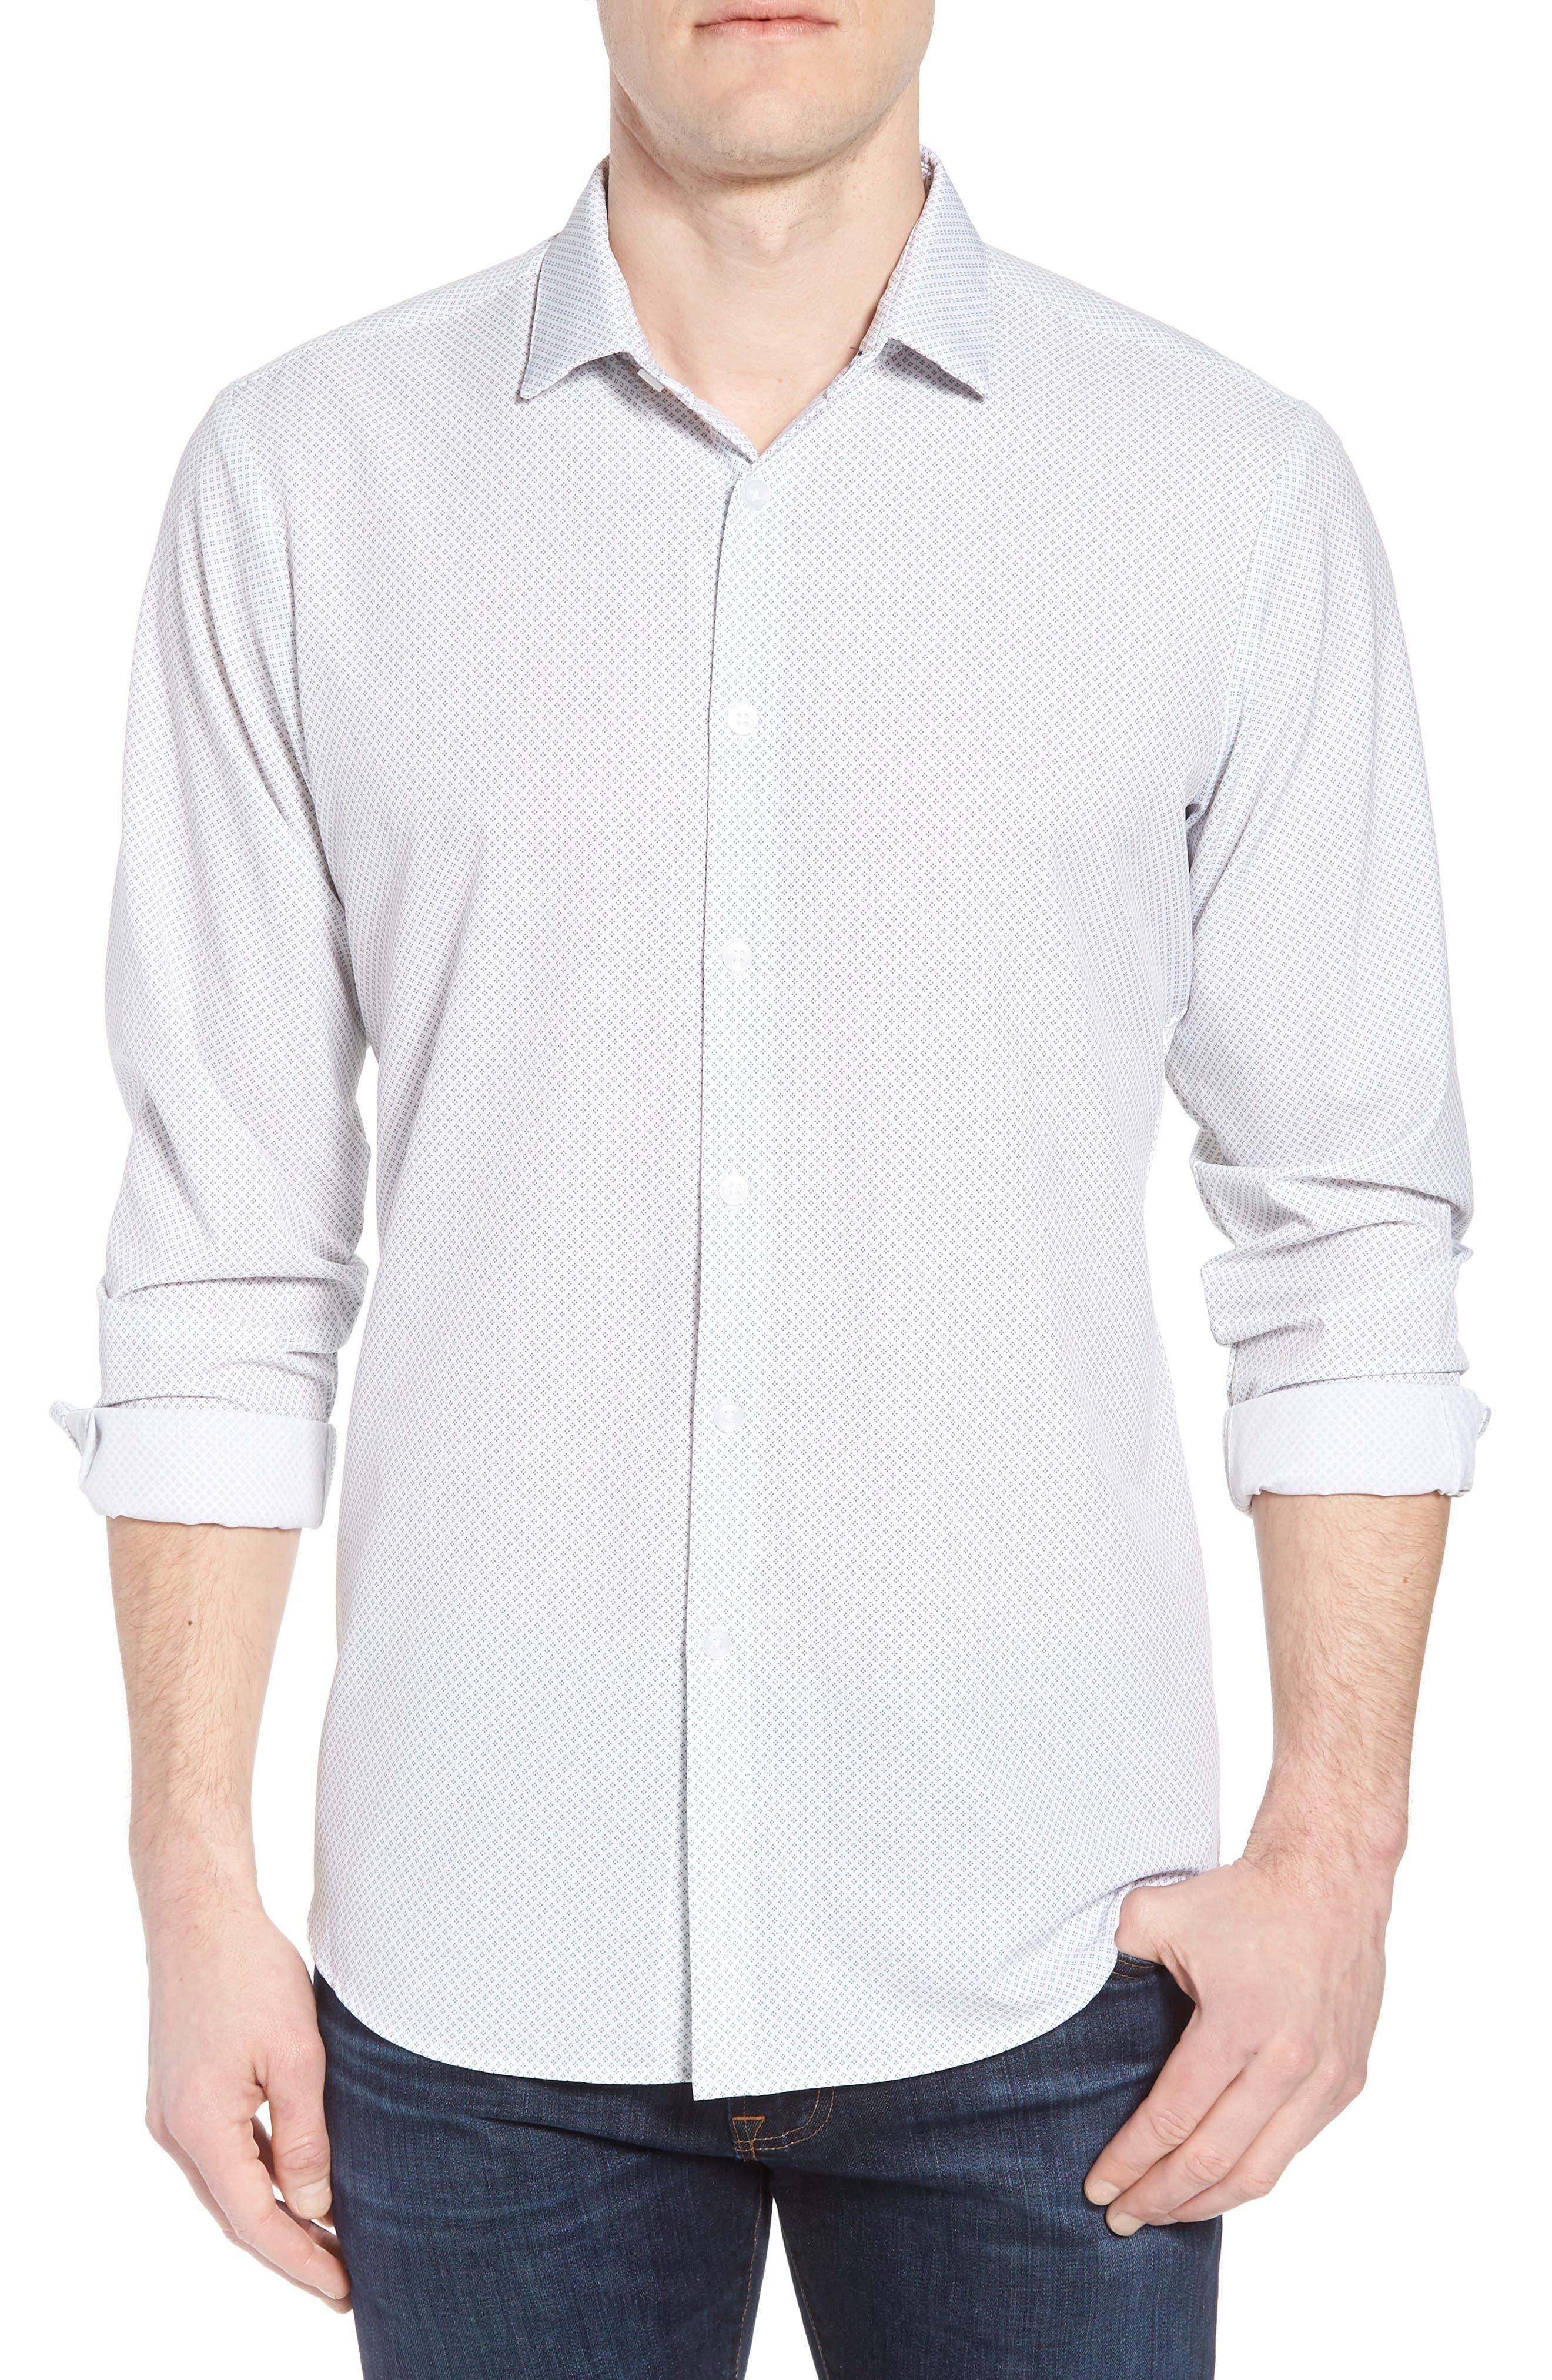 Chambers Performance Sport Shirt,                         Main,                         color, Blue